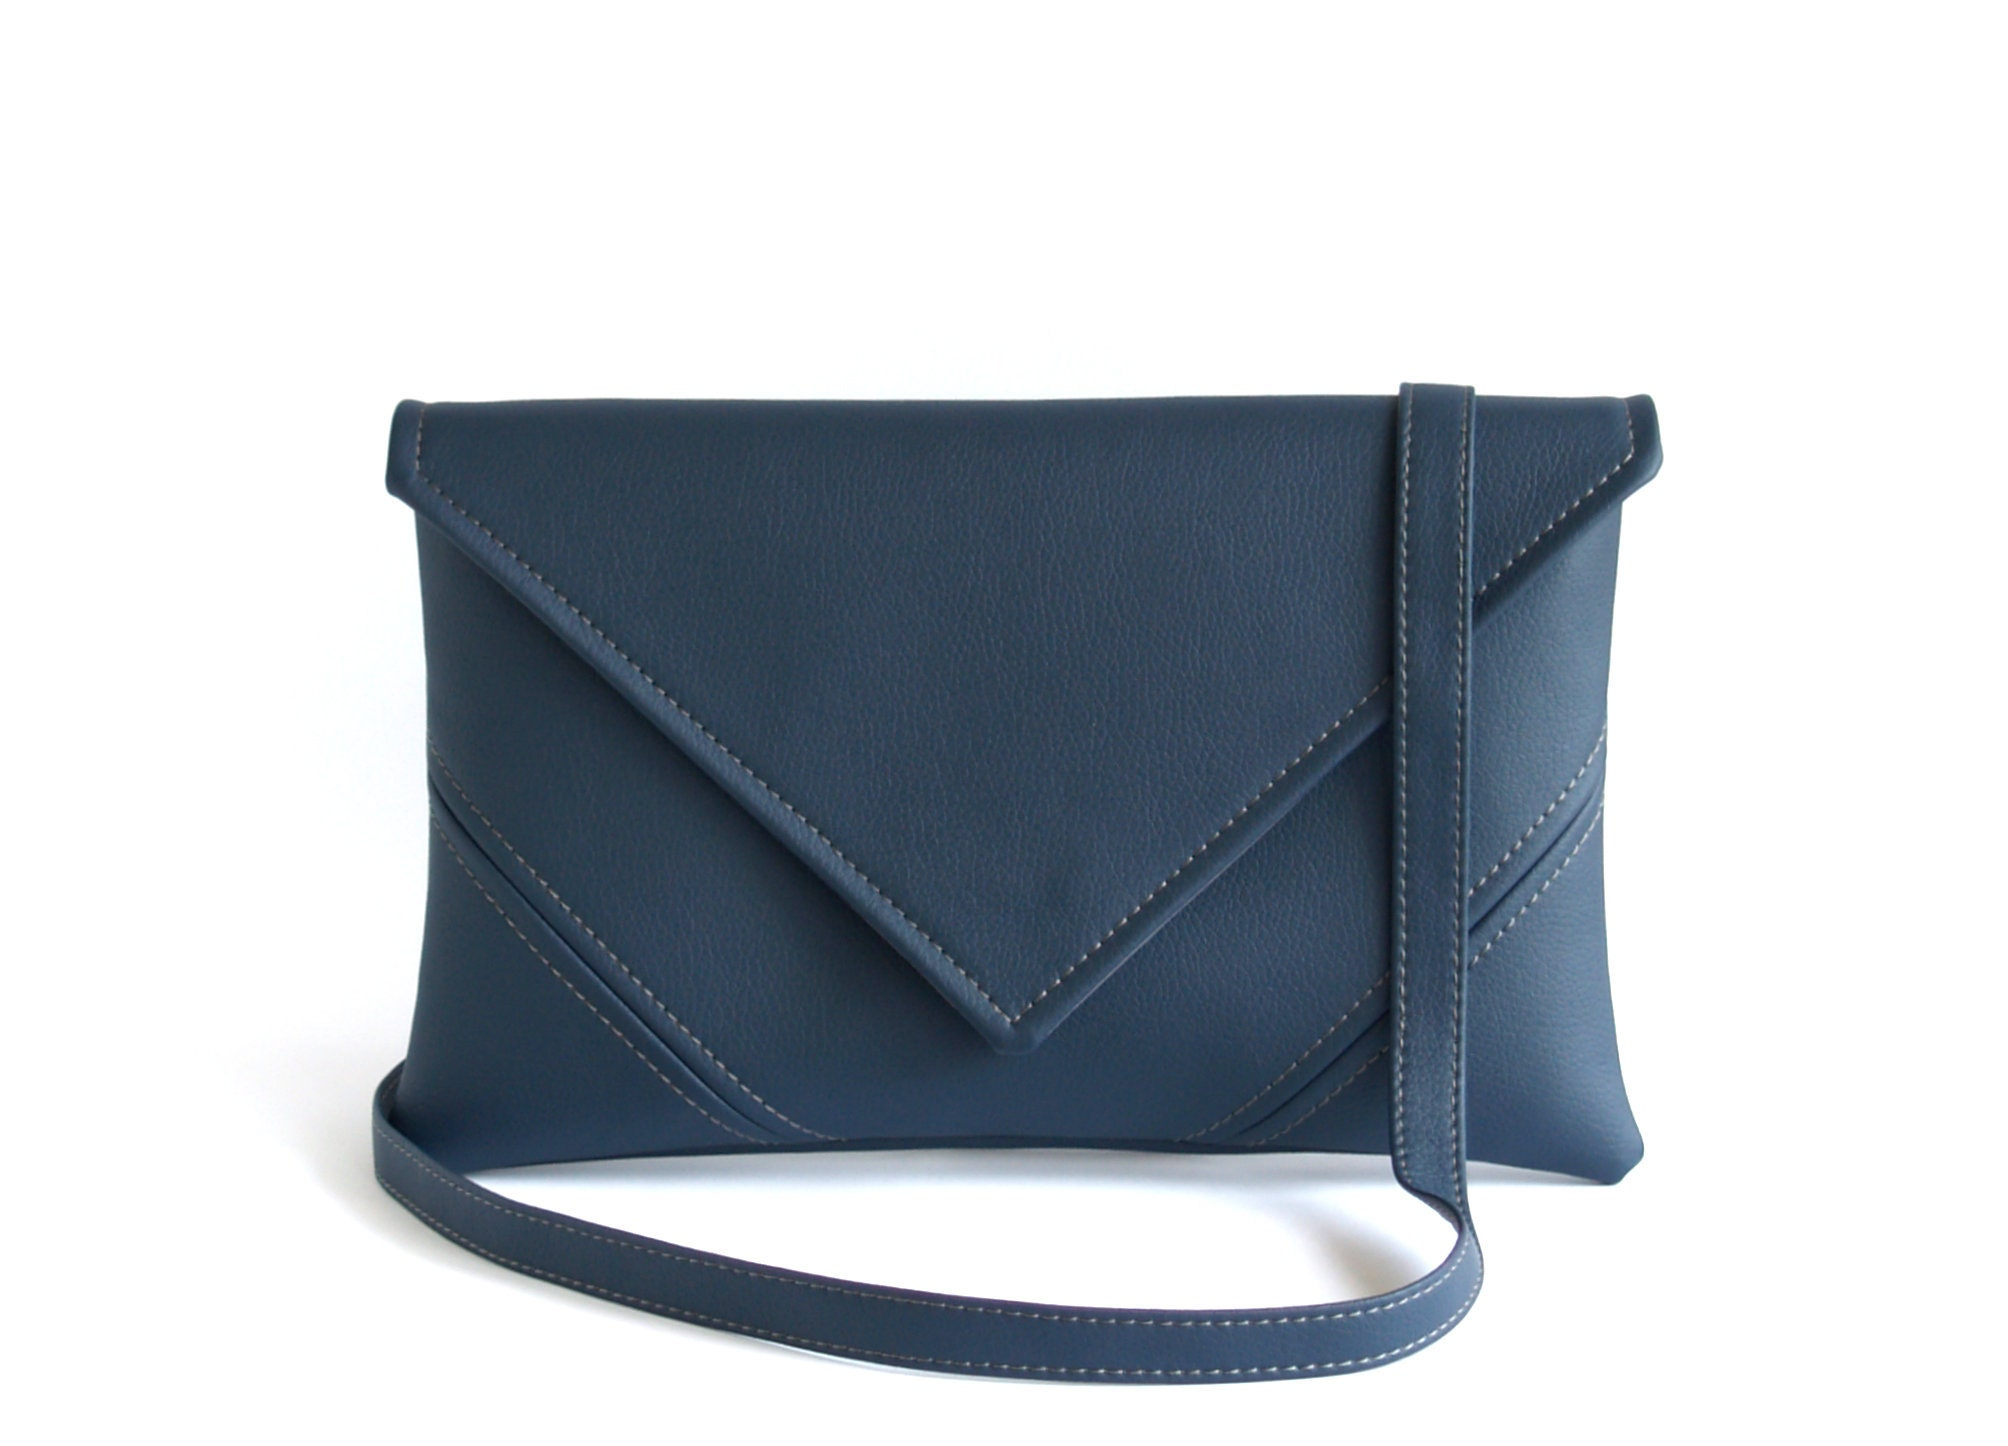 a5e00e7ec00f Vegan Leather Crossbody Bag Unique Gifts For Women Small